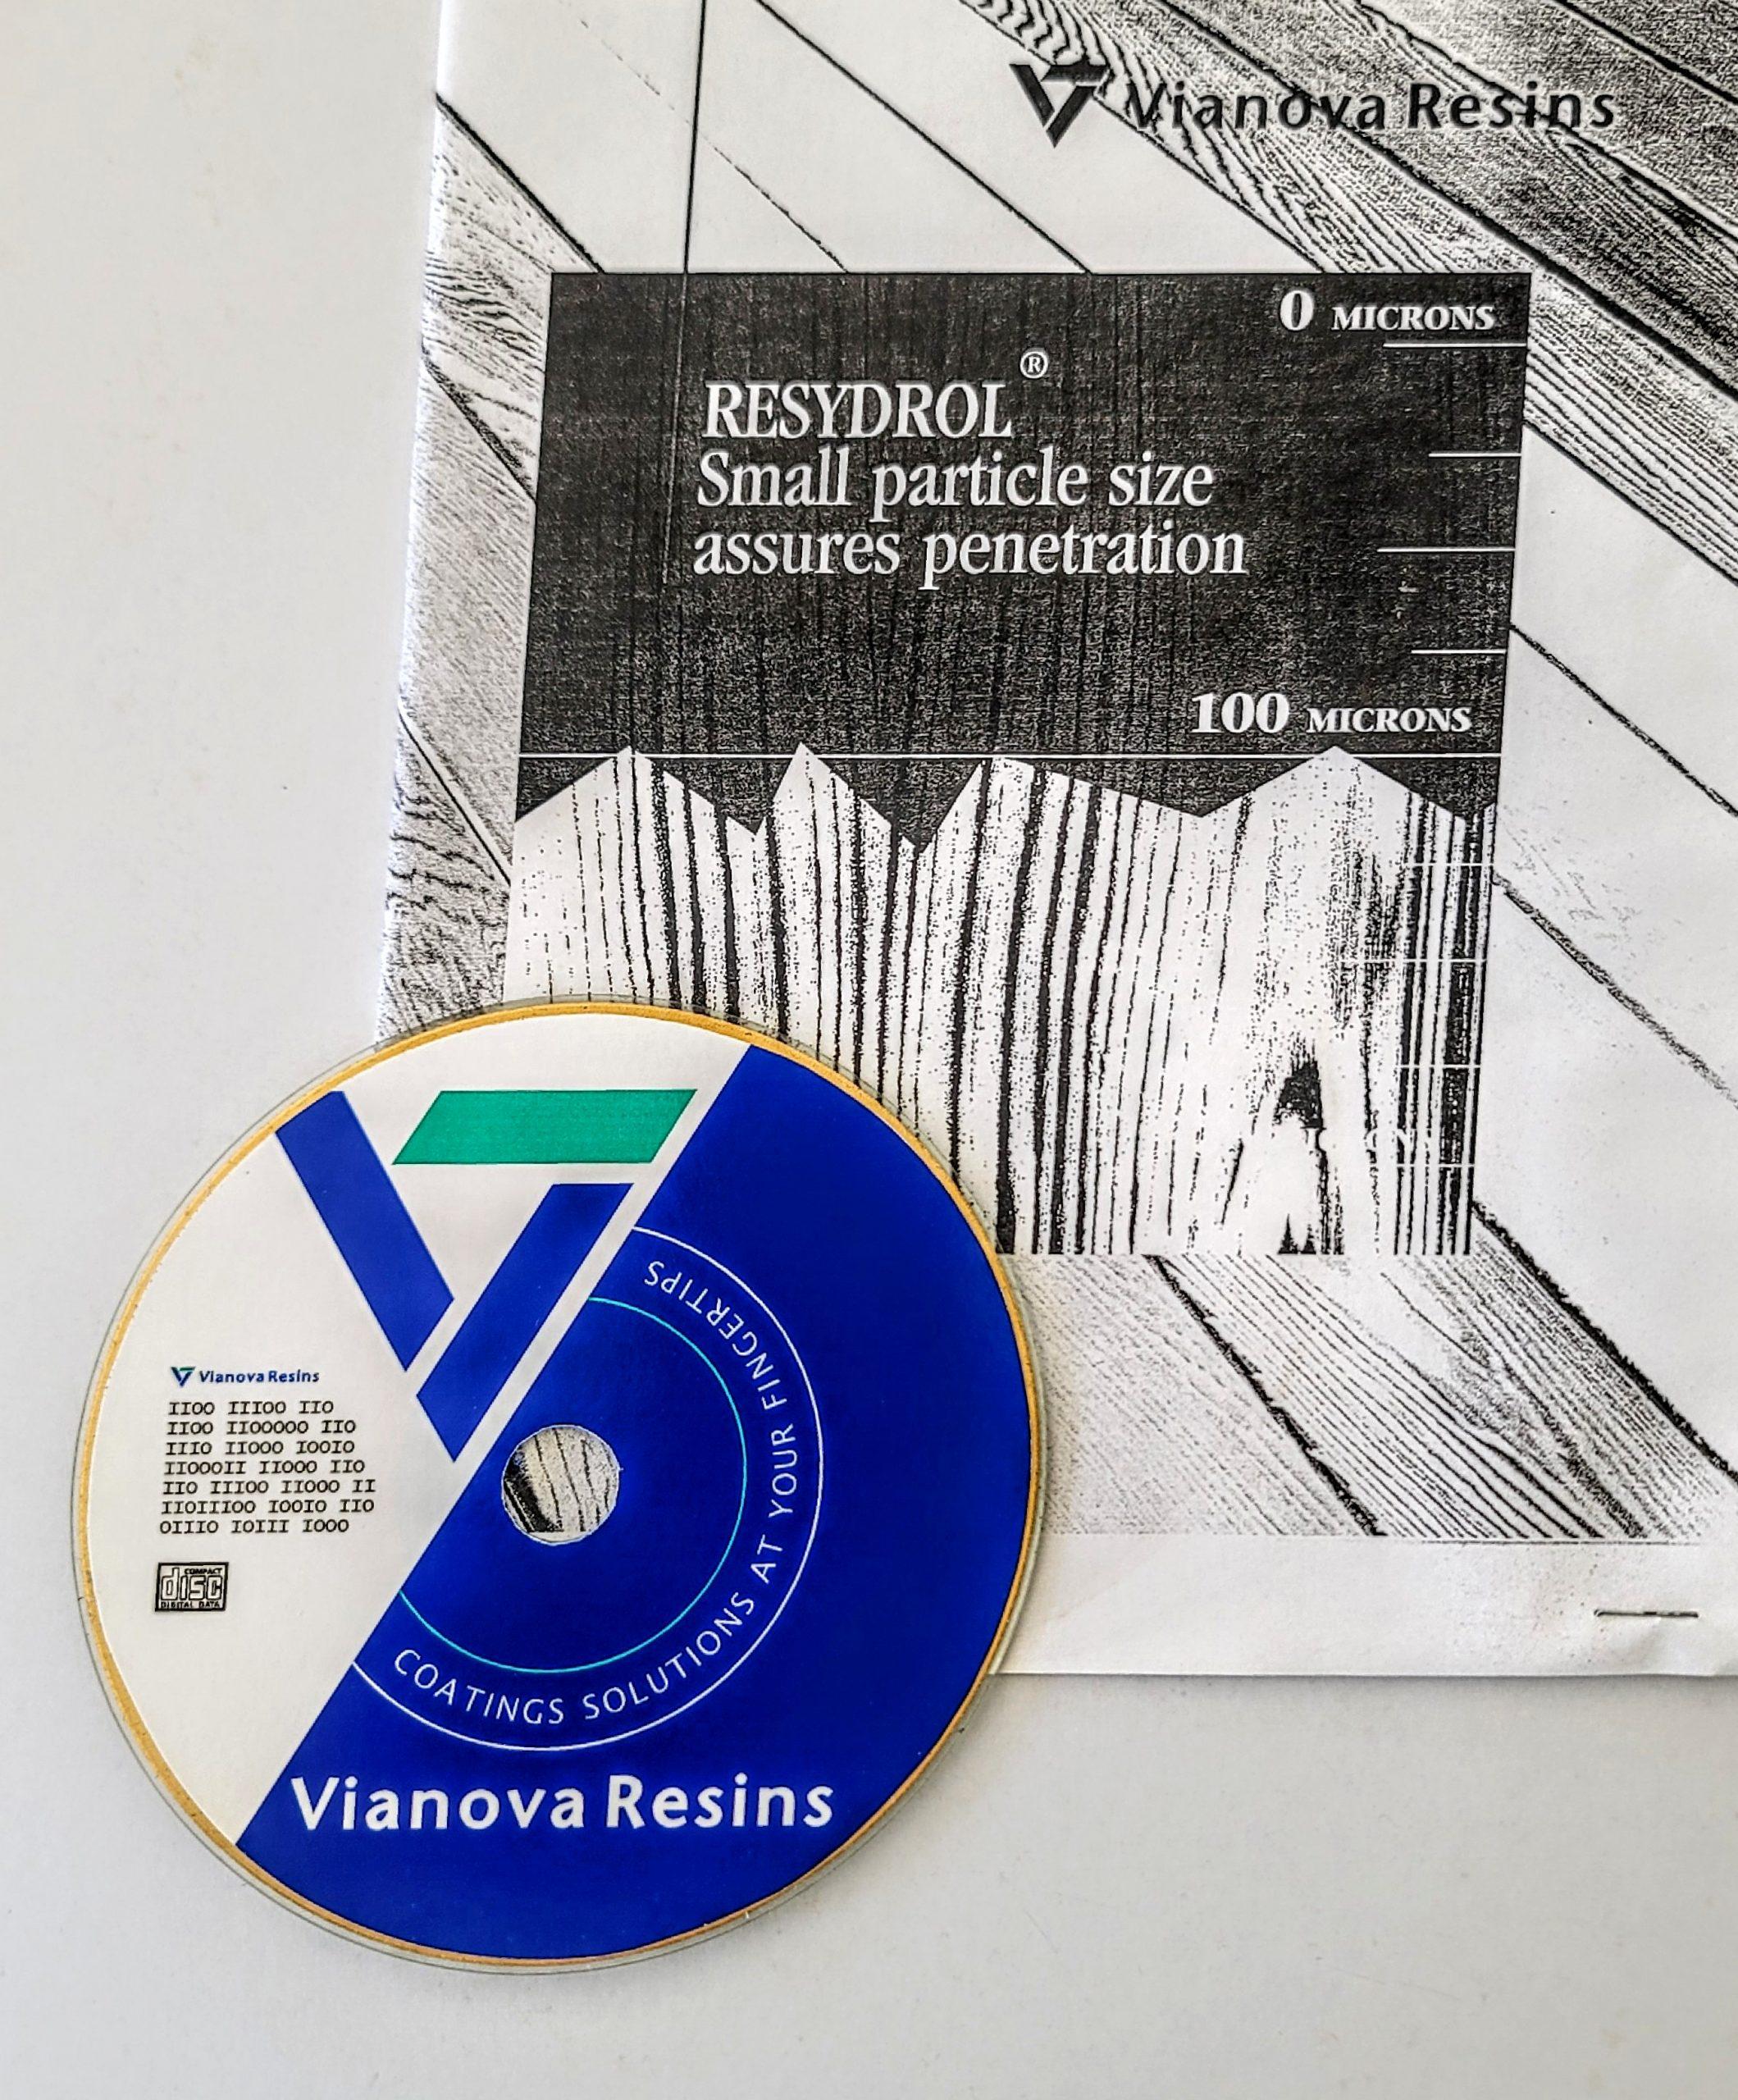 vianova_cd+promo_resydrol_7